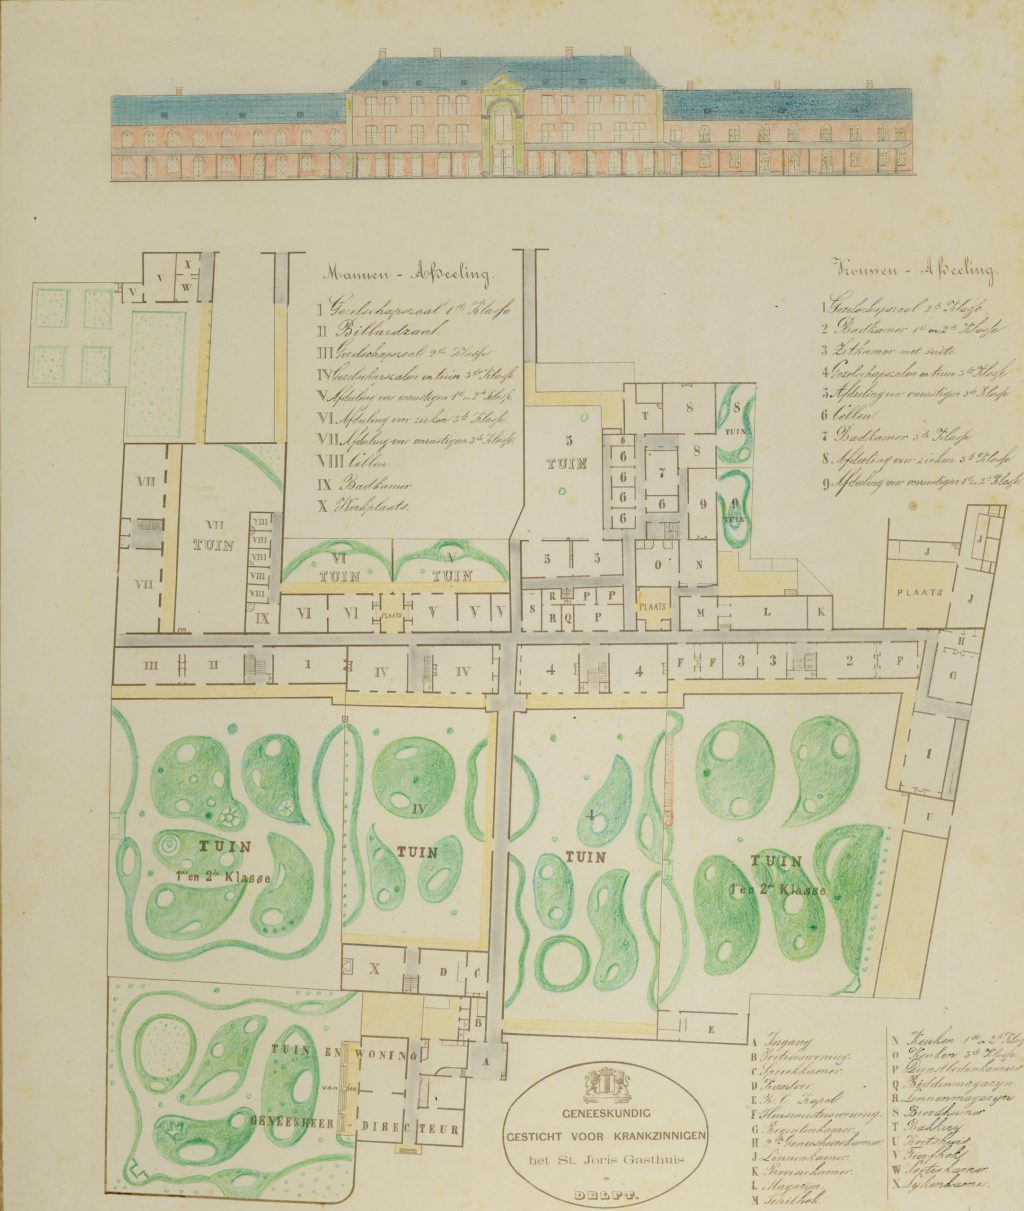 F.C.F. Gräfe, Plattegrond en gevel van het Sint-Jorisgasthuis, 1872 (TMS 64552)